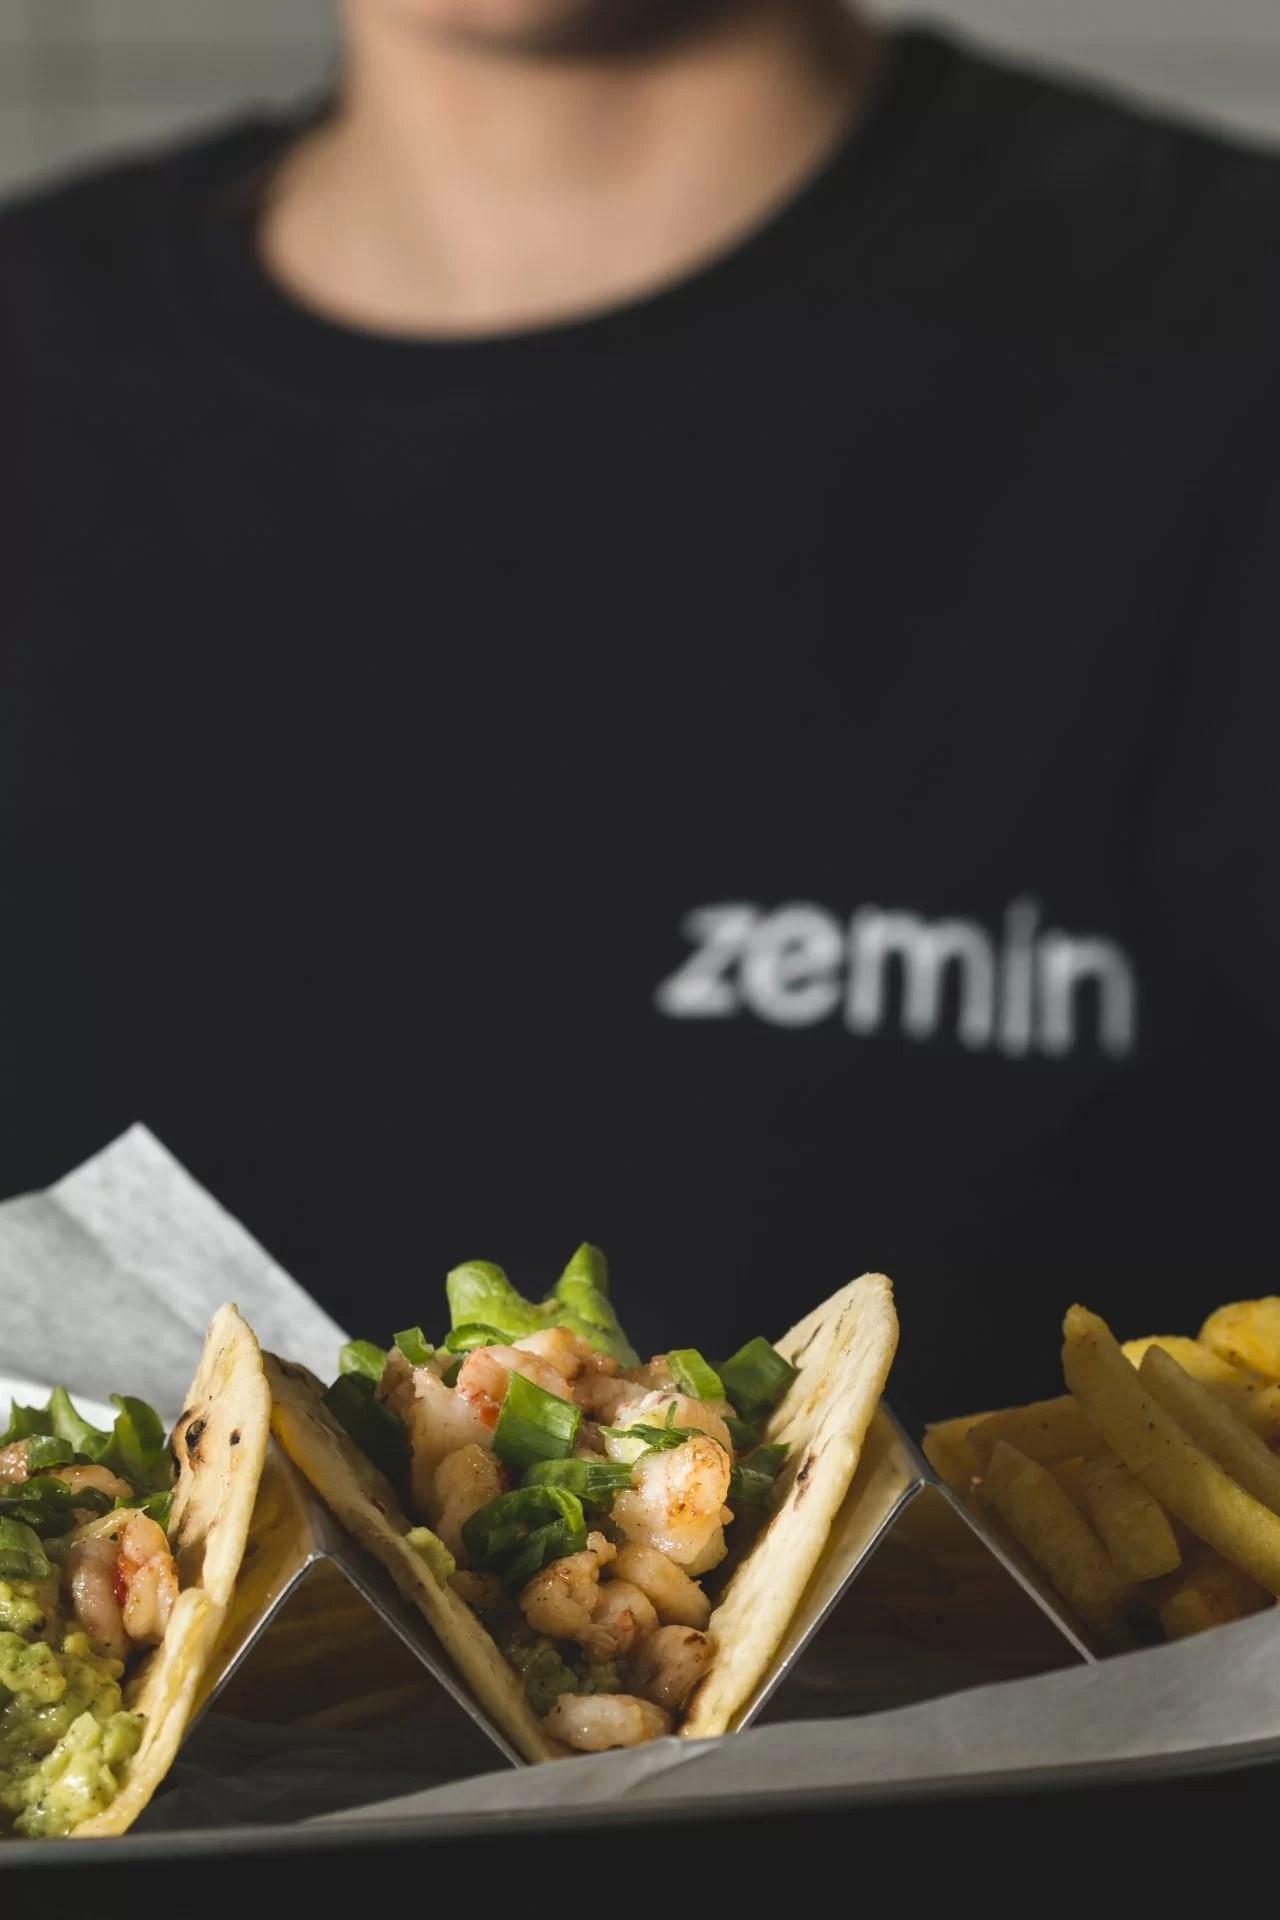 Karides taco ve patates kızartması servisi.